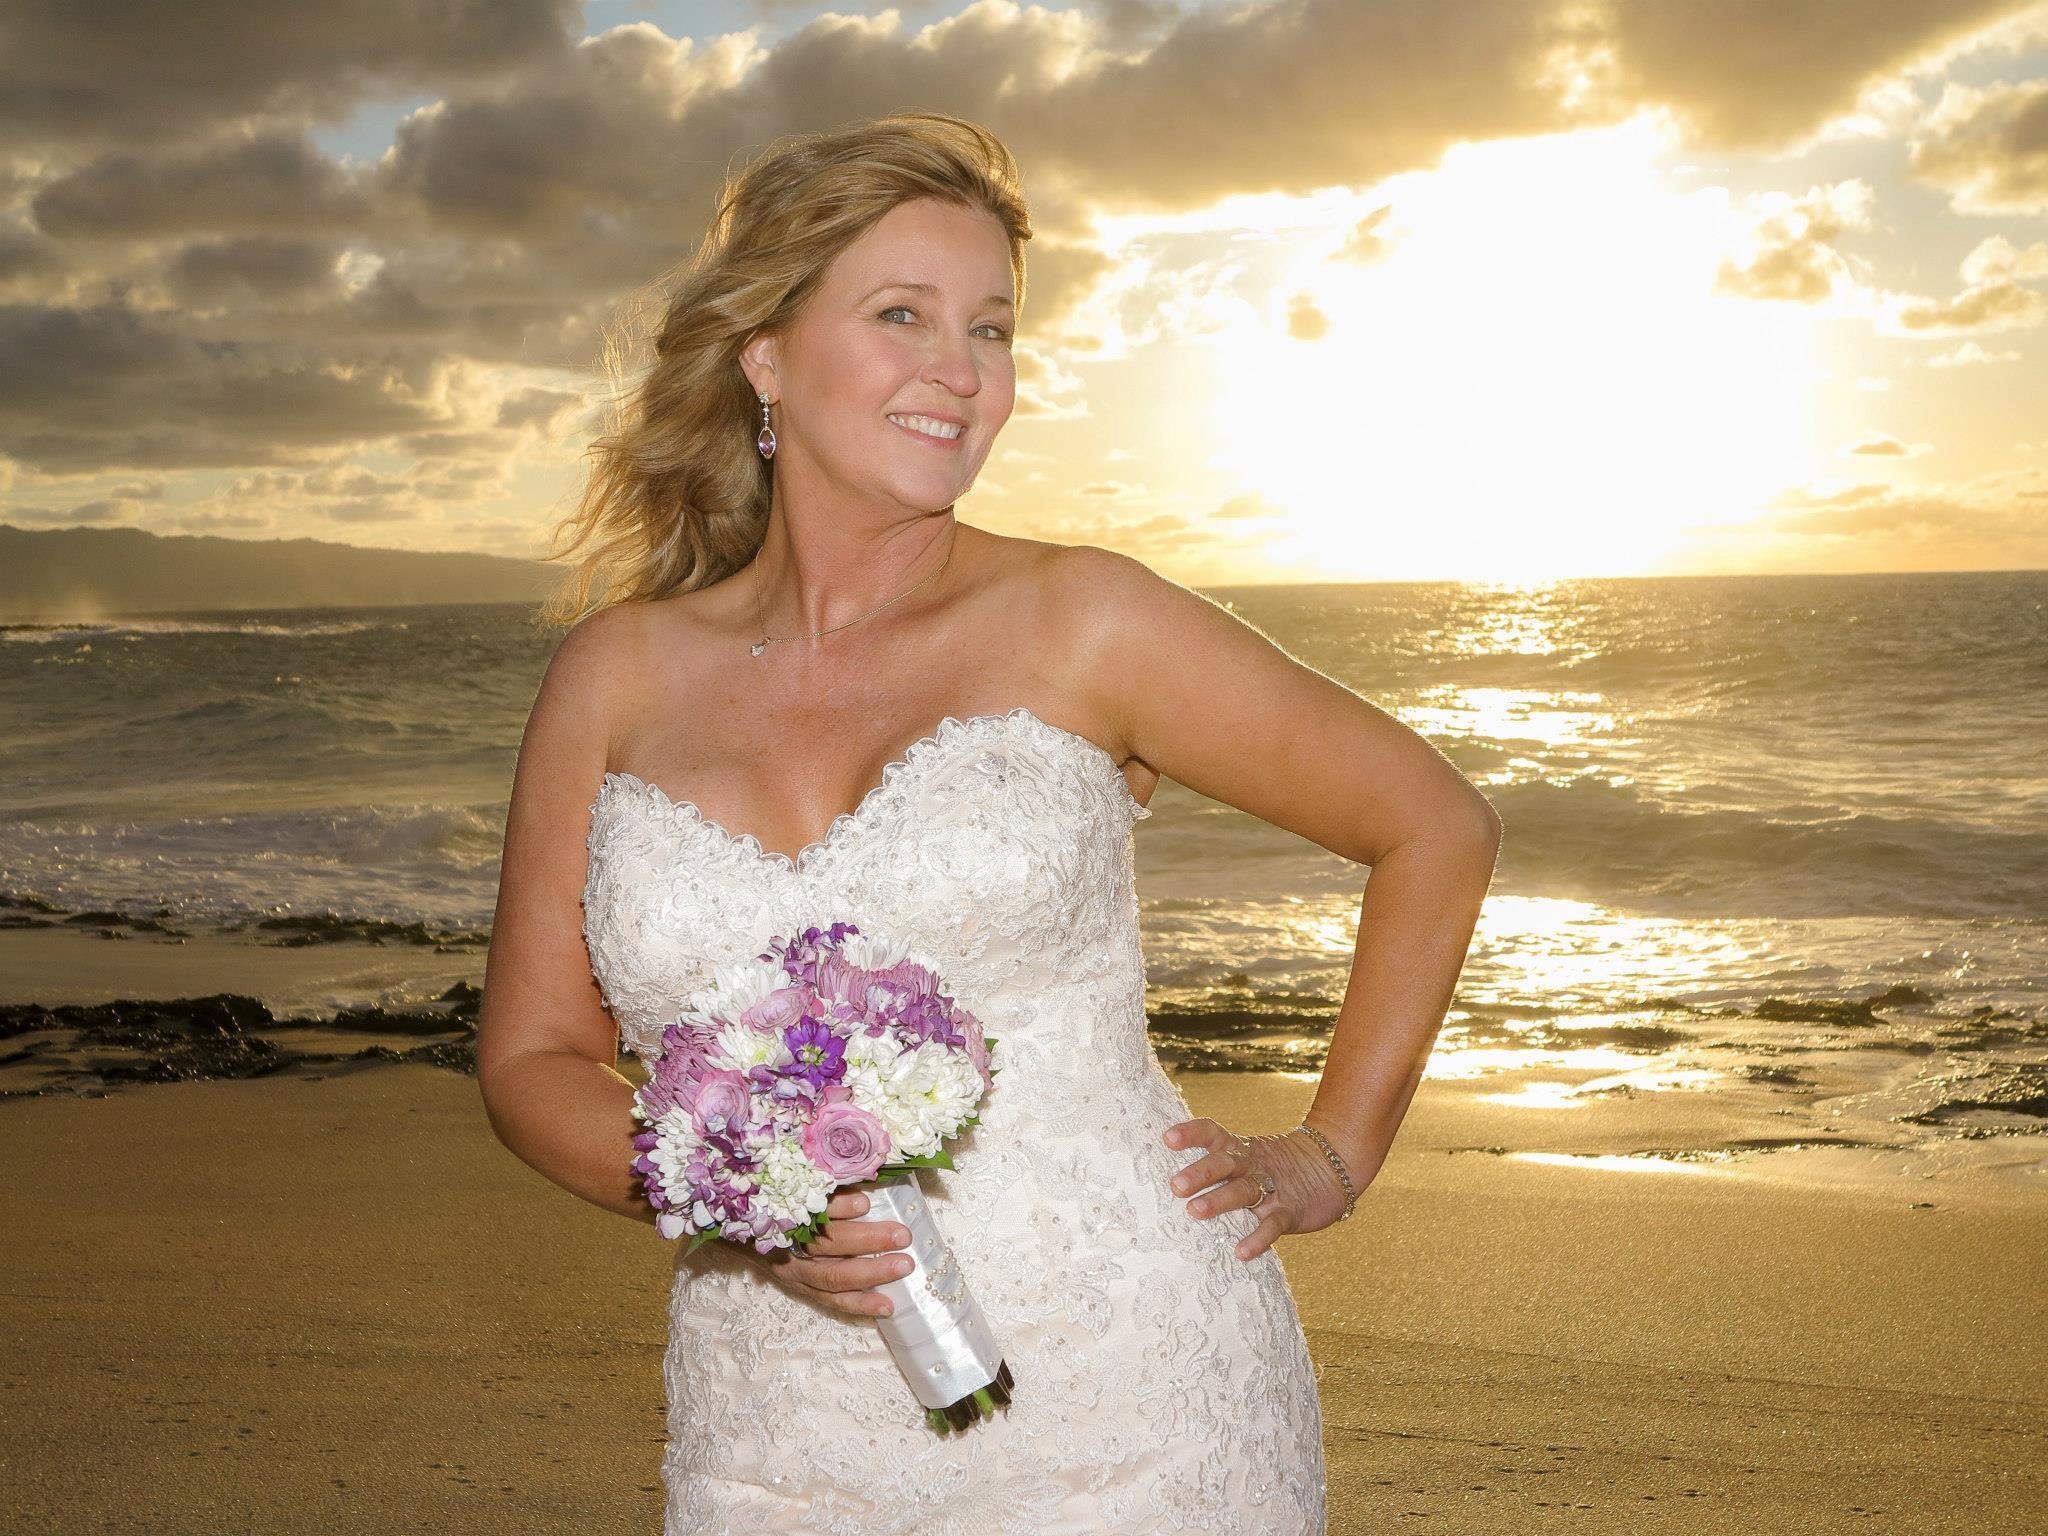 37c3b25ab1ce person kvinde fotografering model romantik tøj hawaii bryllup bryllupskjole  brud ceremoni kjole fotografi skønhed pakker kjole